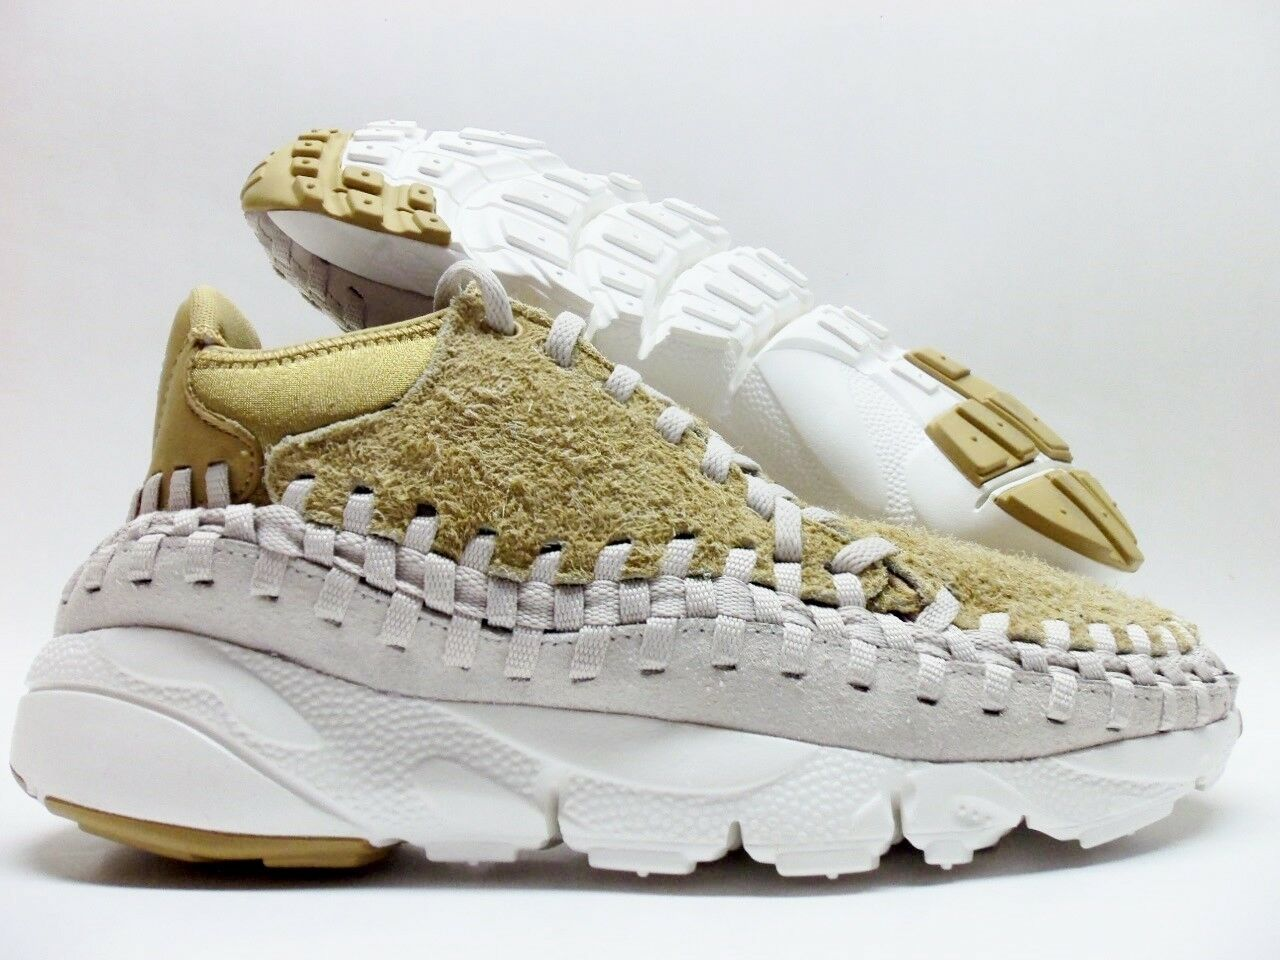 Nike air footscape tessuti ohukka qs appartamento oro / orewood dimensioni uomini 11 [913929-700]